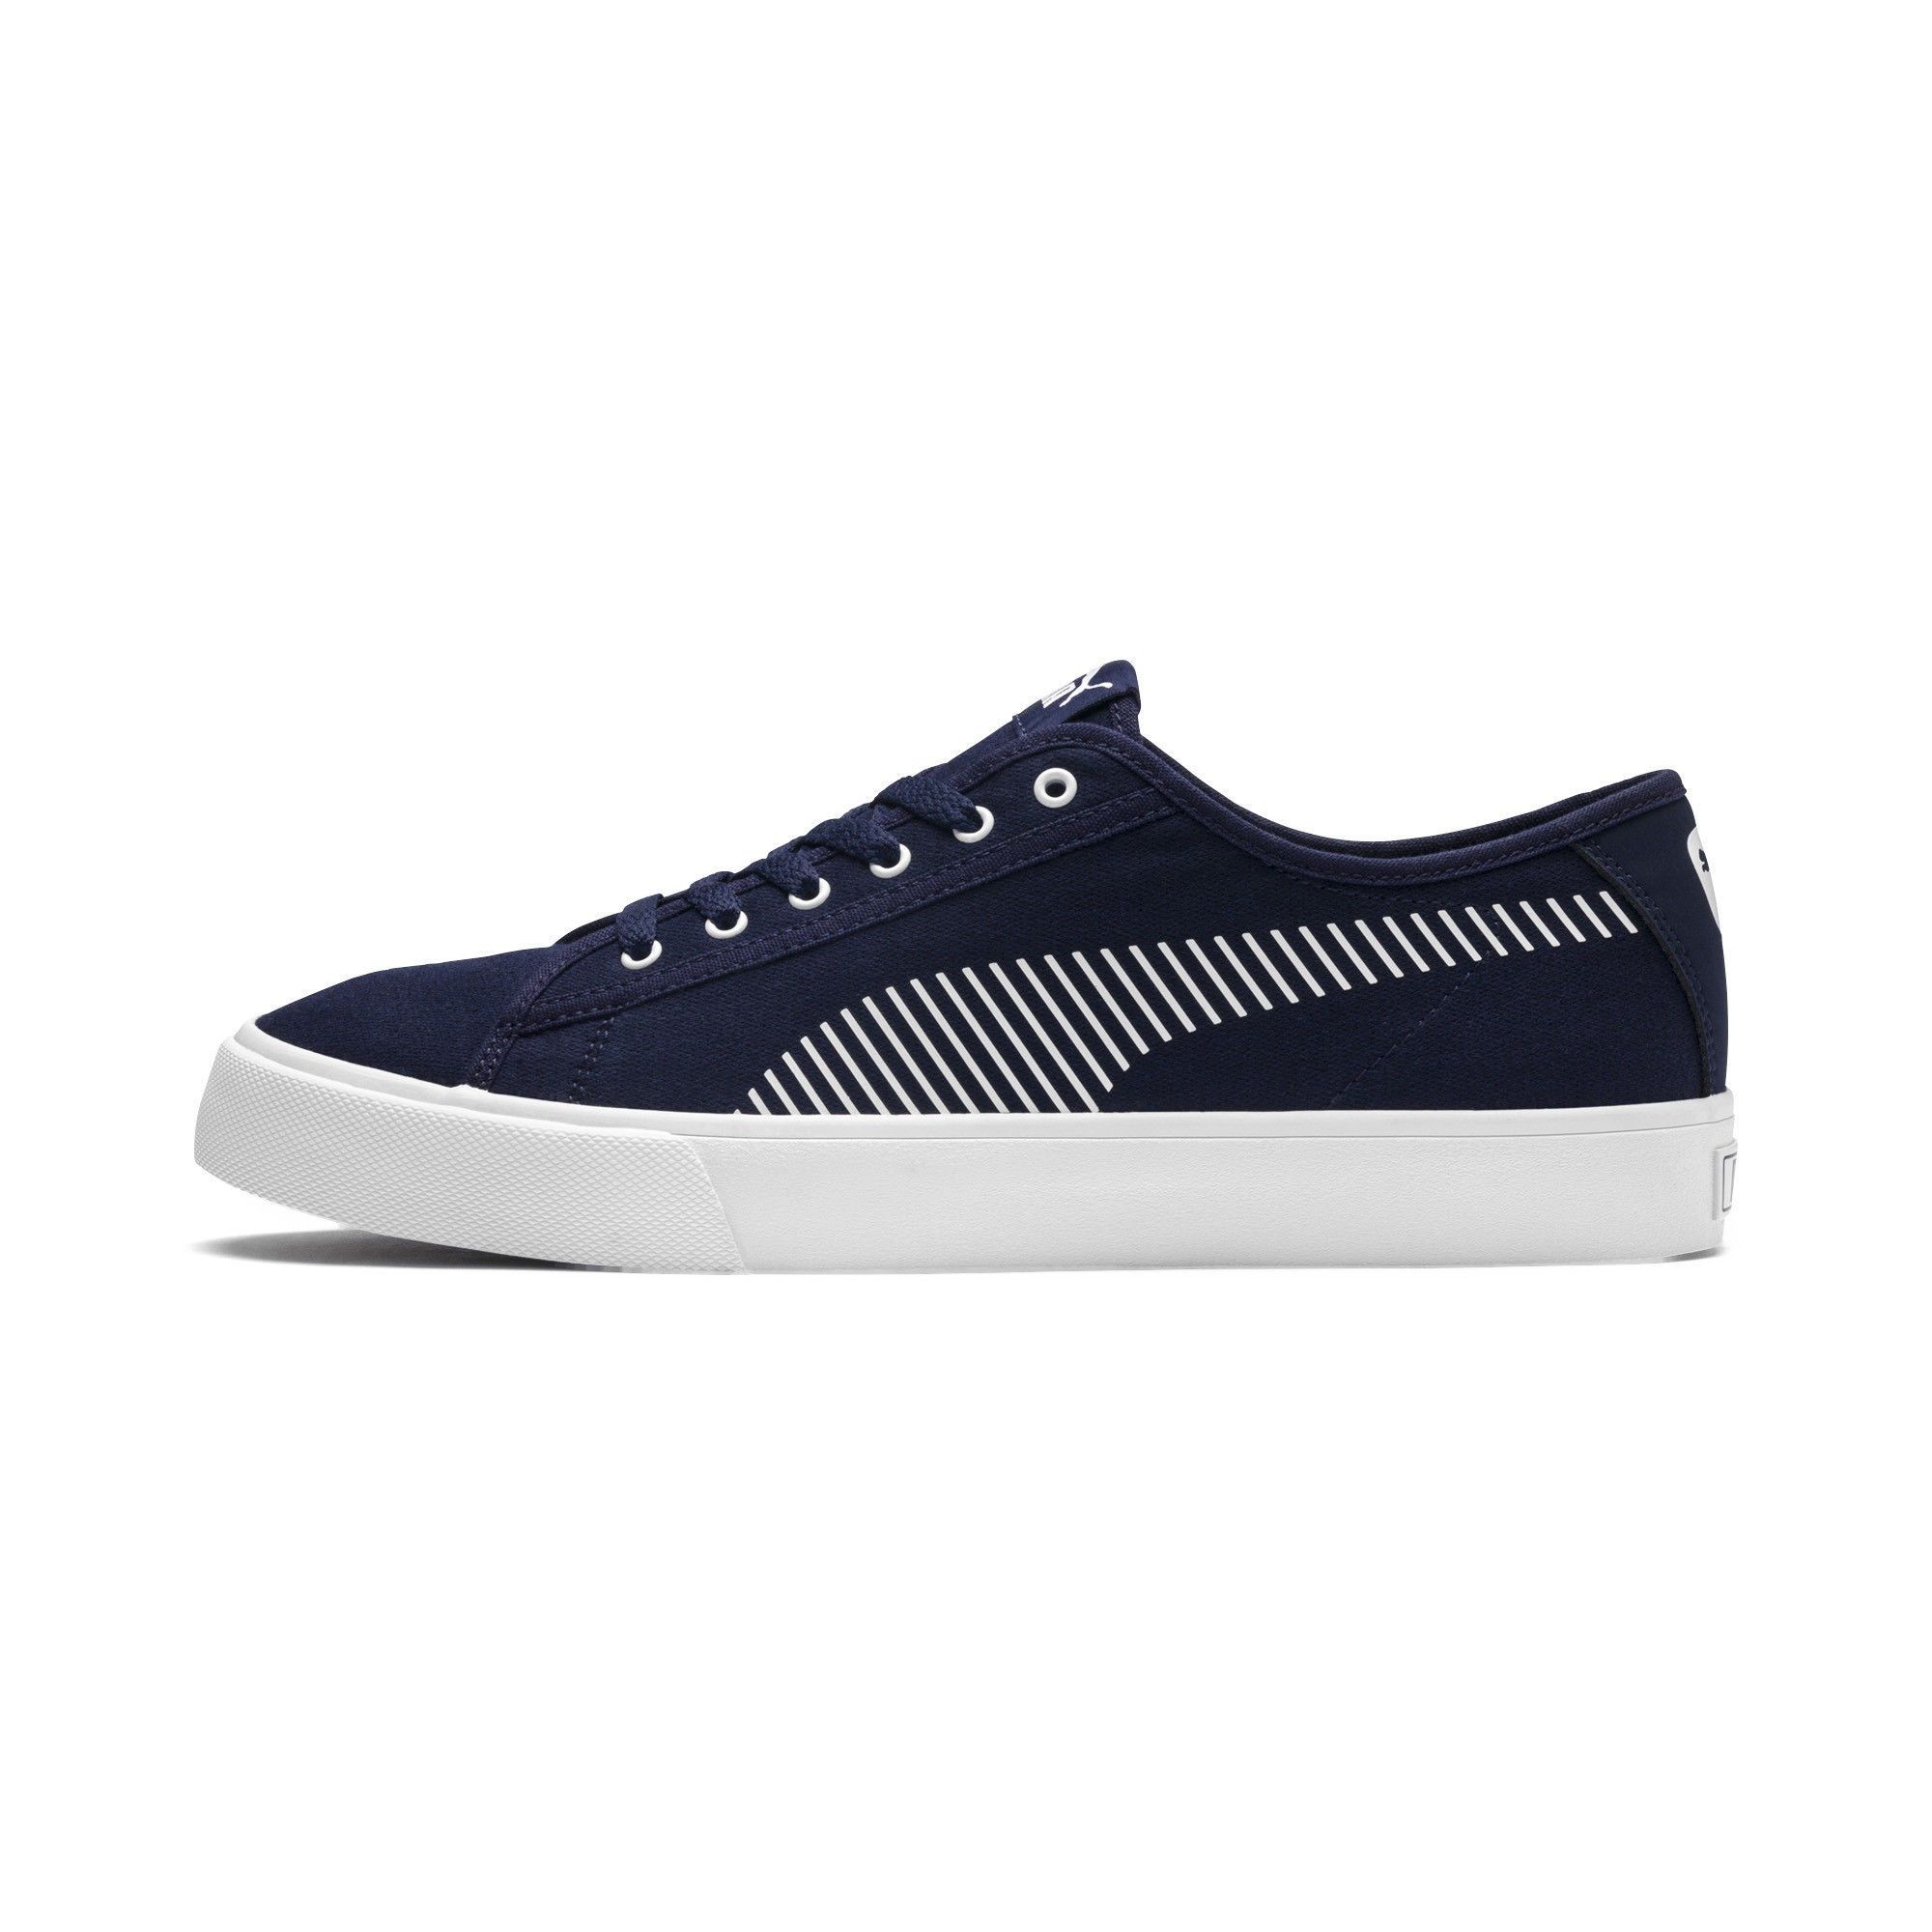 PUMA-Bari-Sneakers-Men-Shoe-Basics thumbnail 15